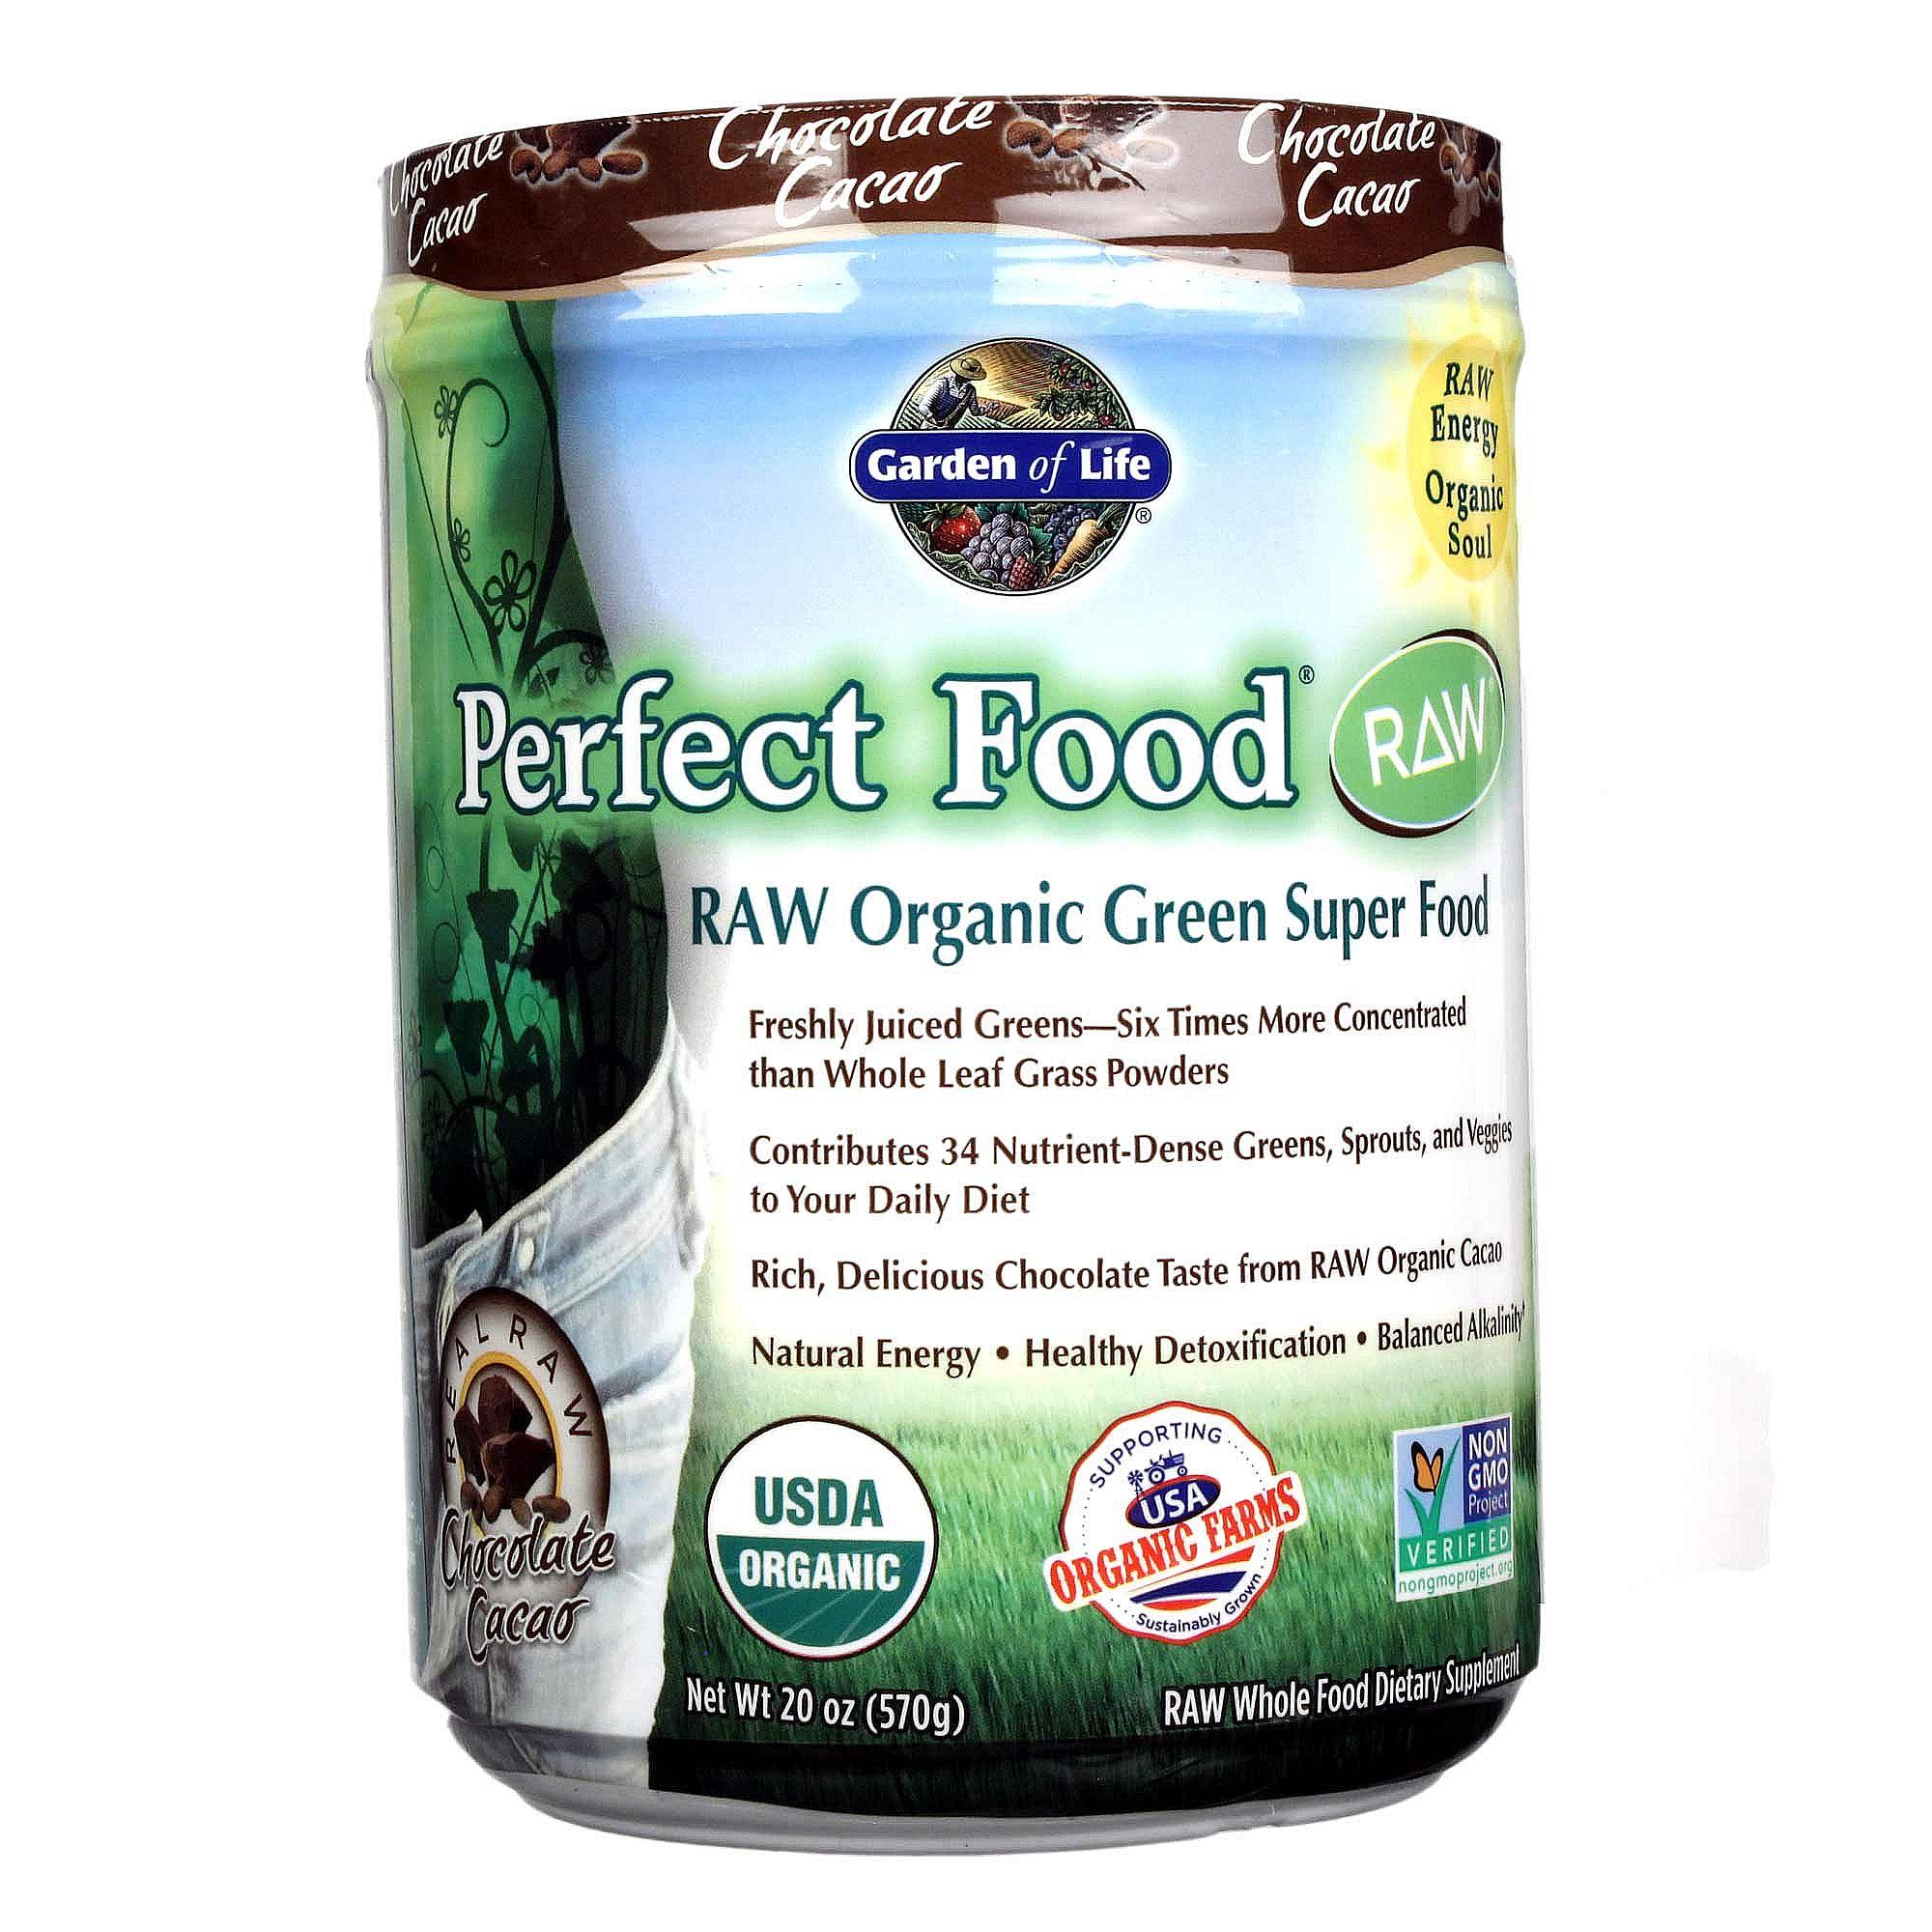 Garden Of Life Perfect Food Raw Organic Chocolate Cacao 20 Oz